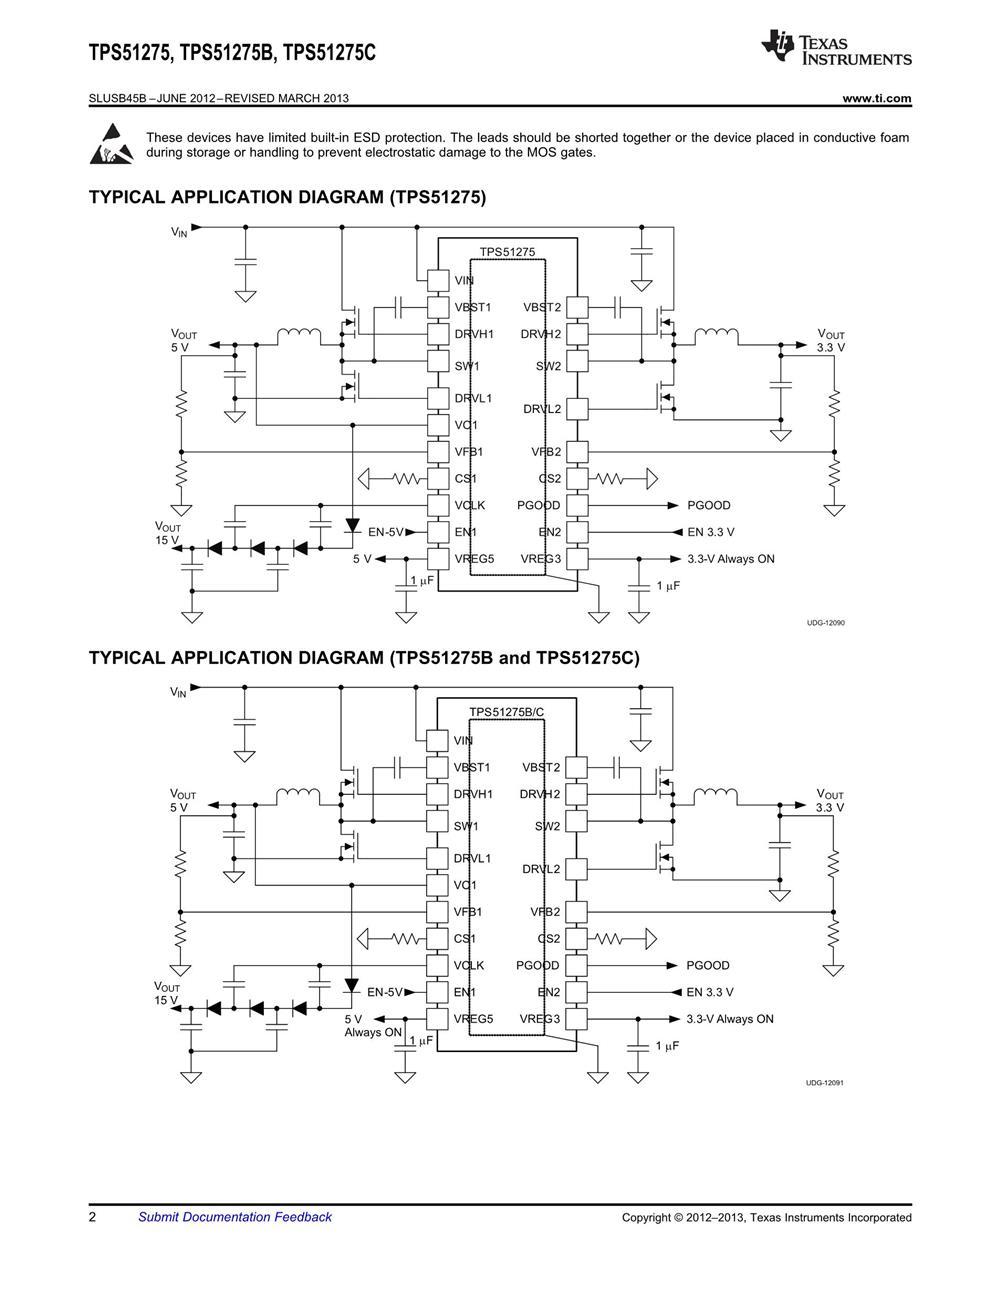 TPS51275BRUKR's pdf picture 2